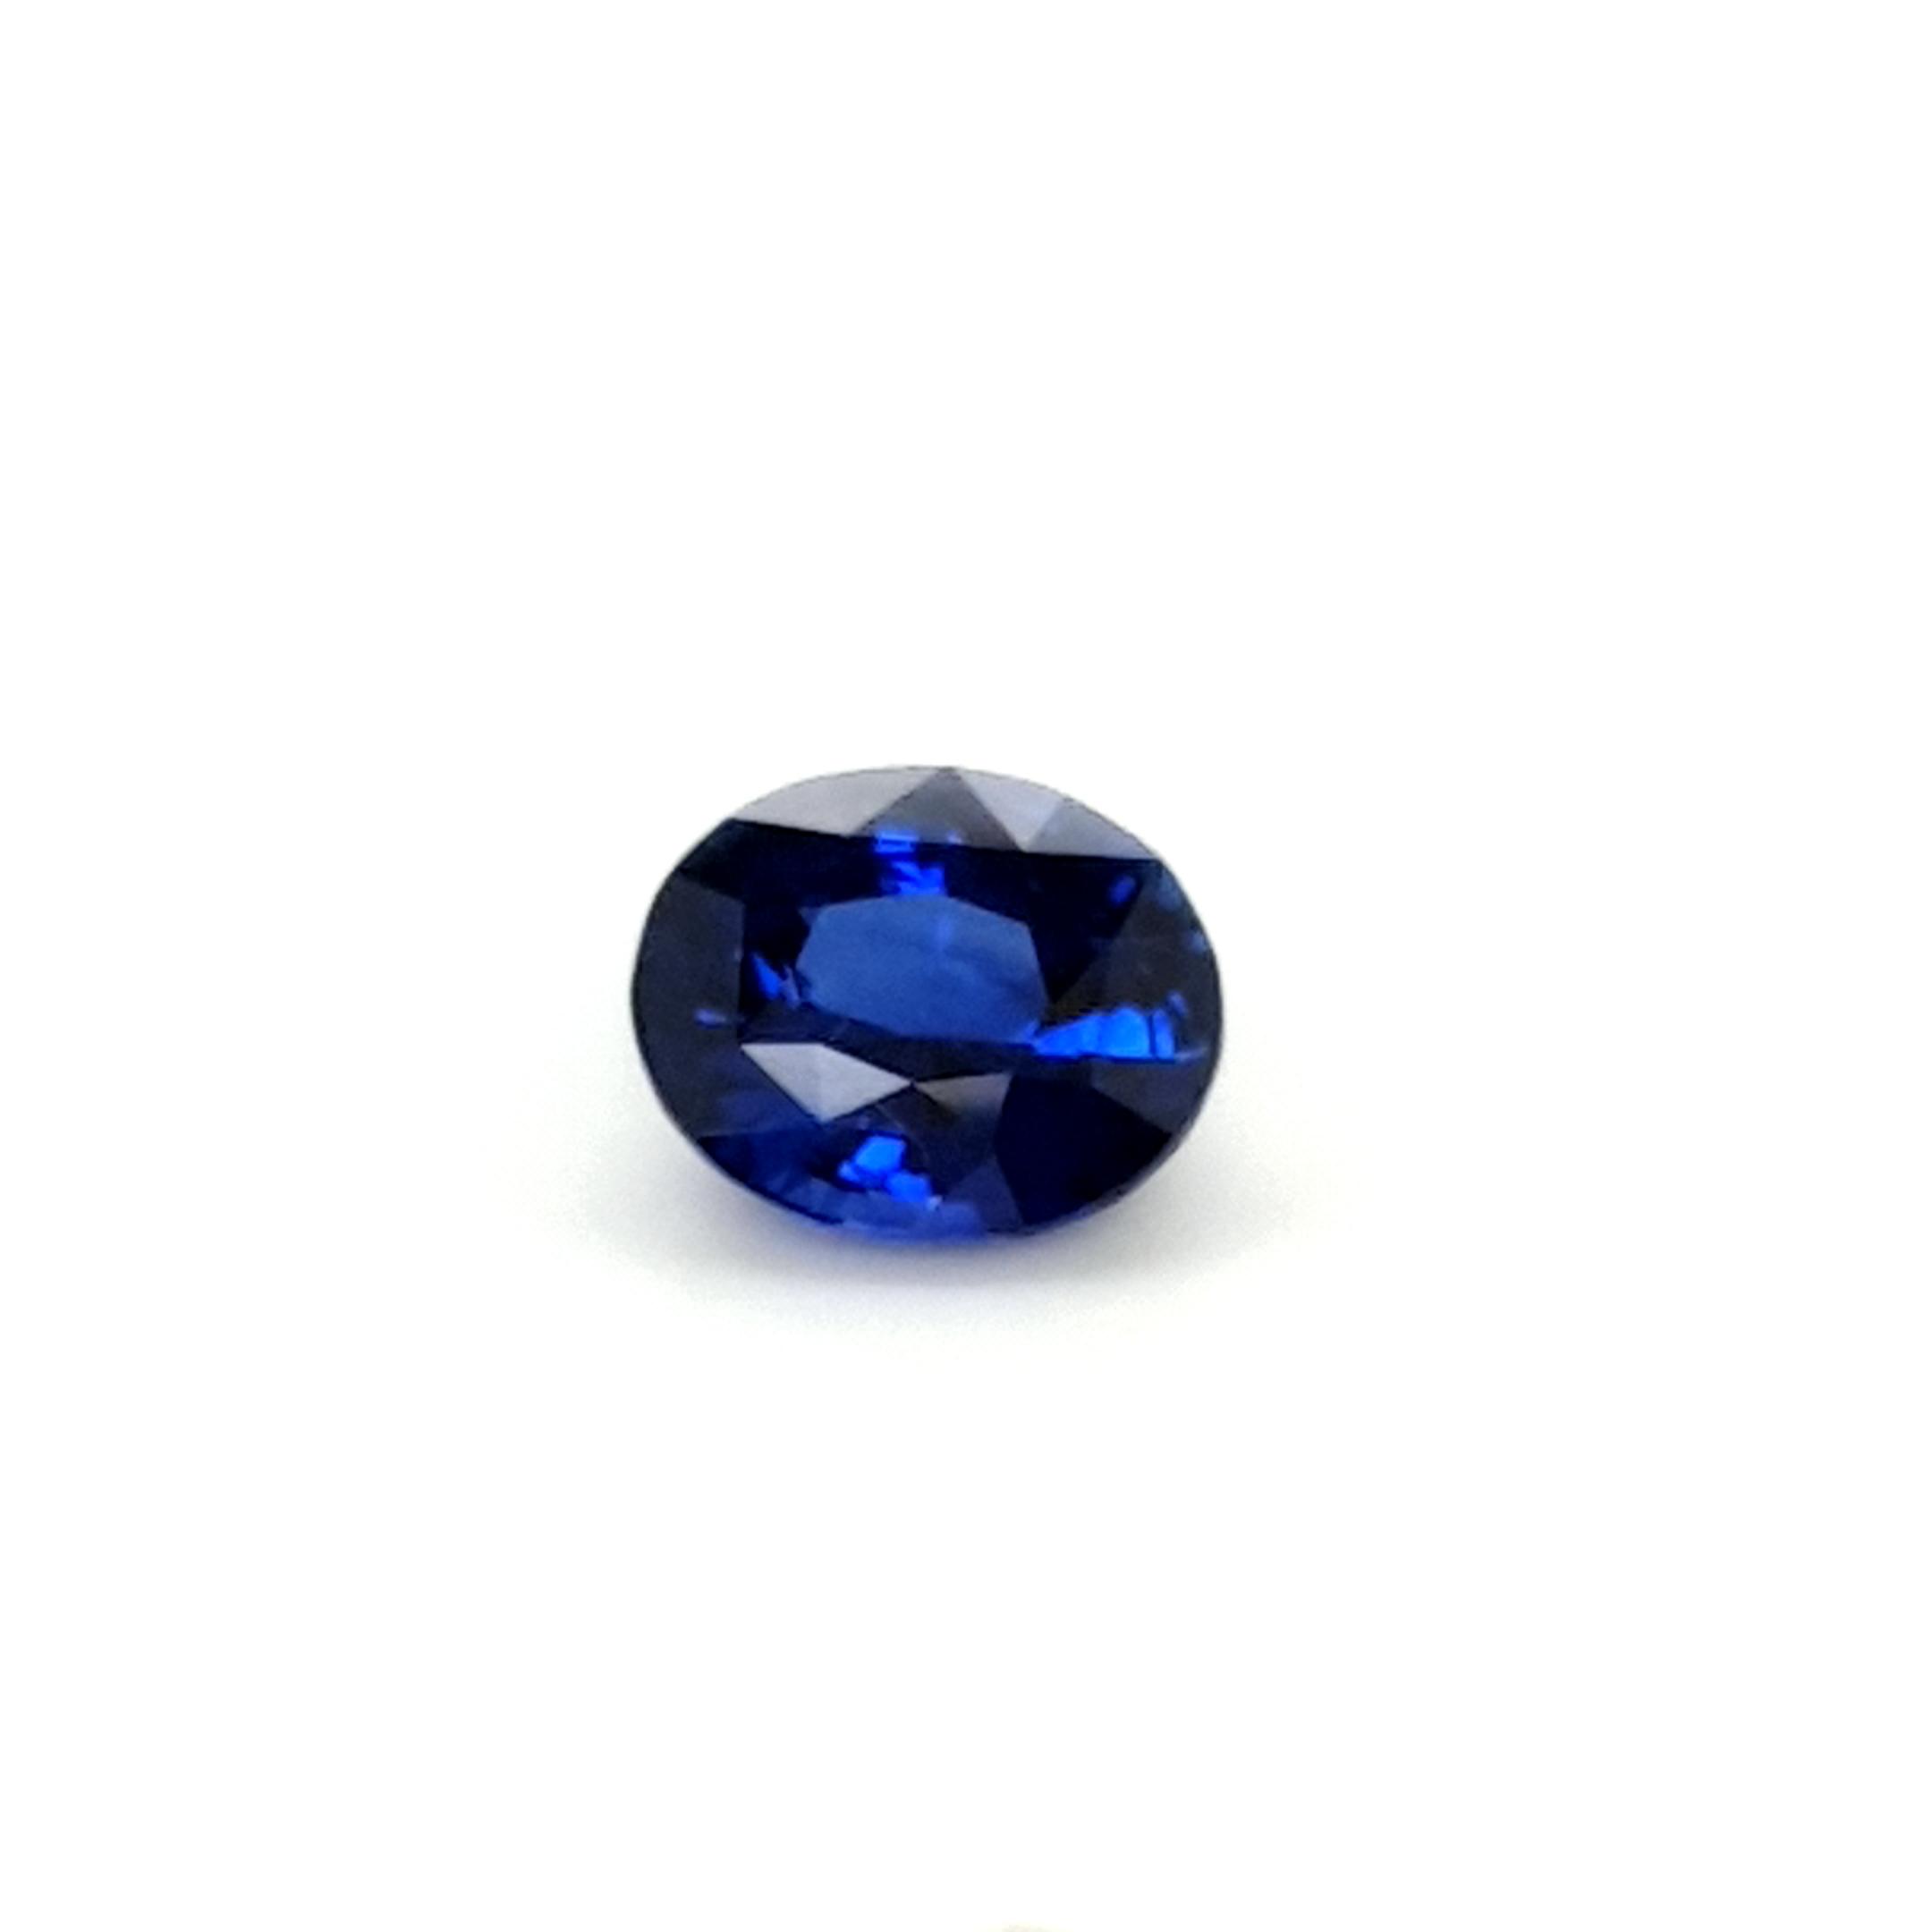 2,55ct. Sapphire RoyalBlue SAB16D6 ClaudiaHamann__2021-06-02-14-28-44